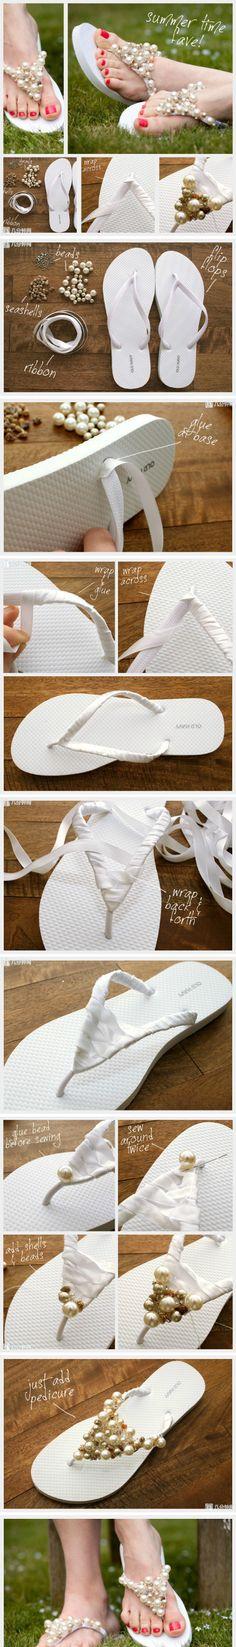 Cute and Easy DIY flip flops crafts-crafts-crafts Flip Flops Diy, Diy Mode, Beaded Sandals, Jeweled Sandals, Diy Clothing, Diy Tutorial, Diy Fashion, Diy Wedding, Wedding Shoes